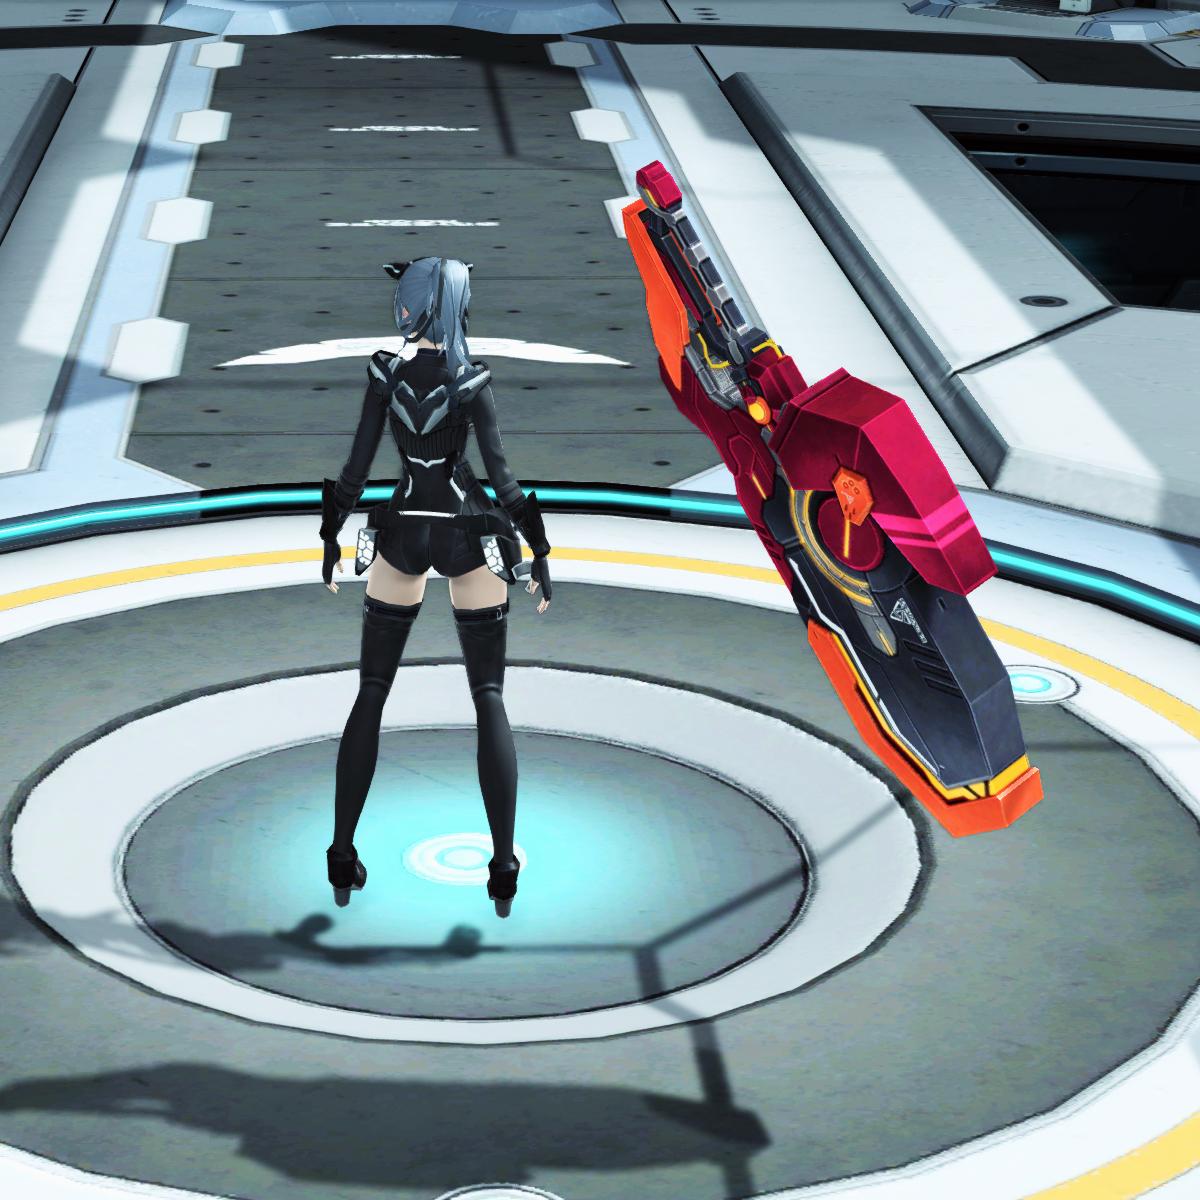 PSO2 Phantasy Star Online 2 MMORPG Sega Ilteon Dusk Megith Wand sheathed